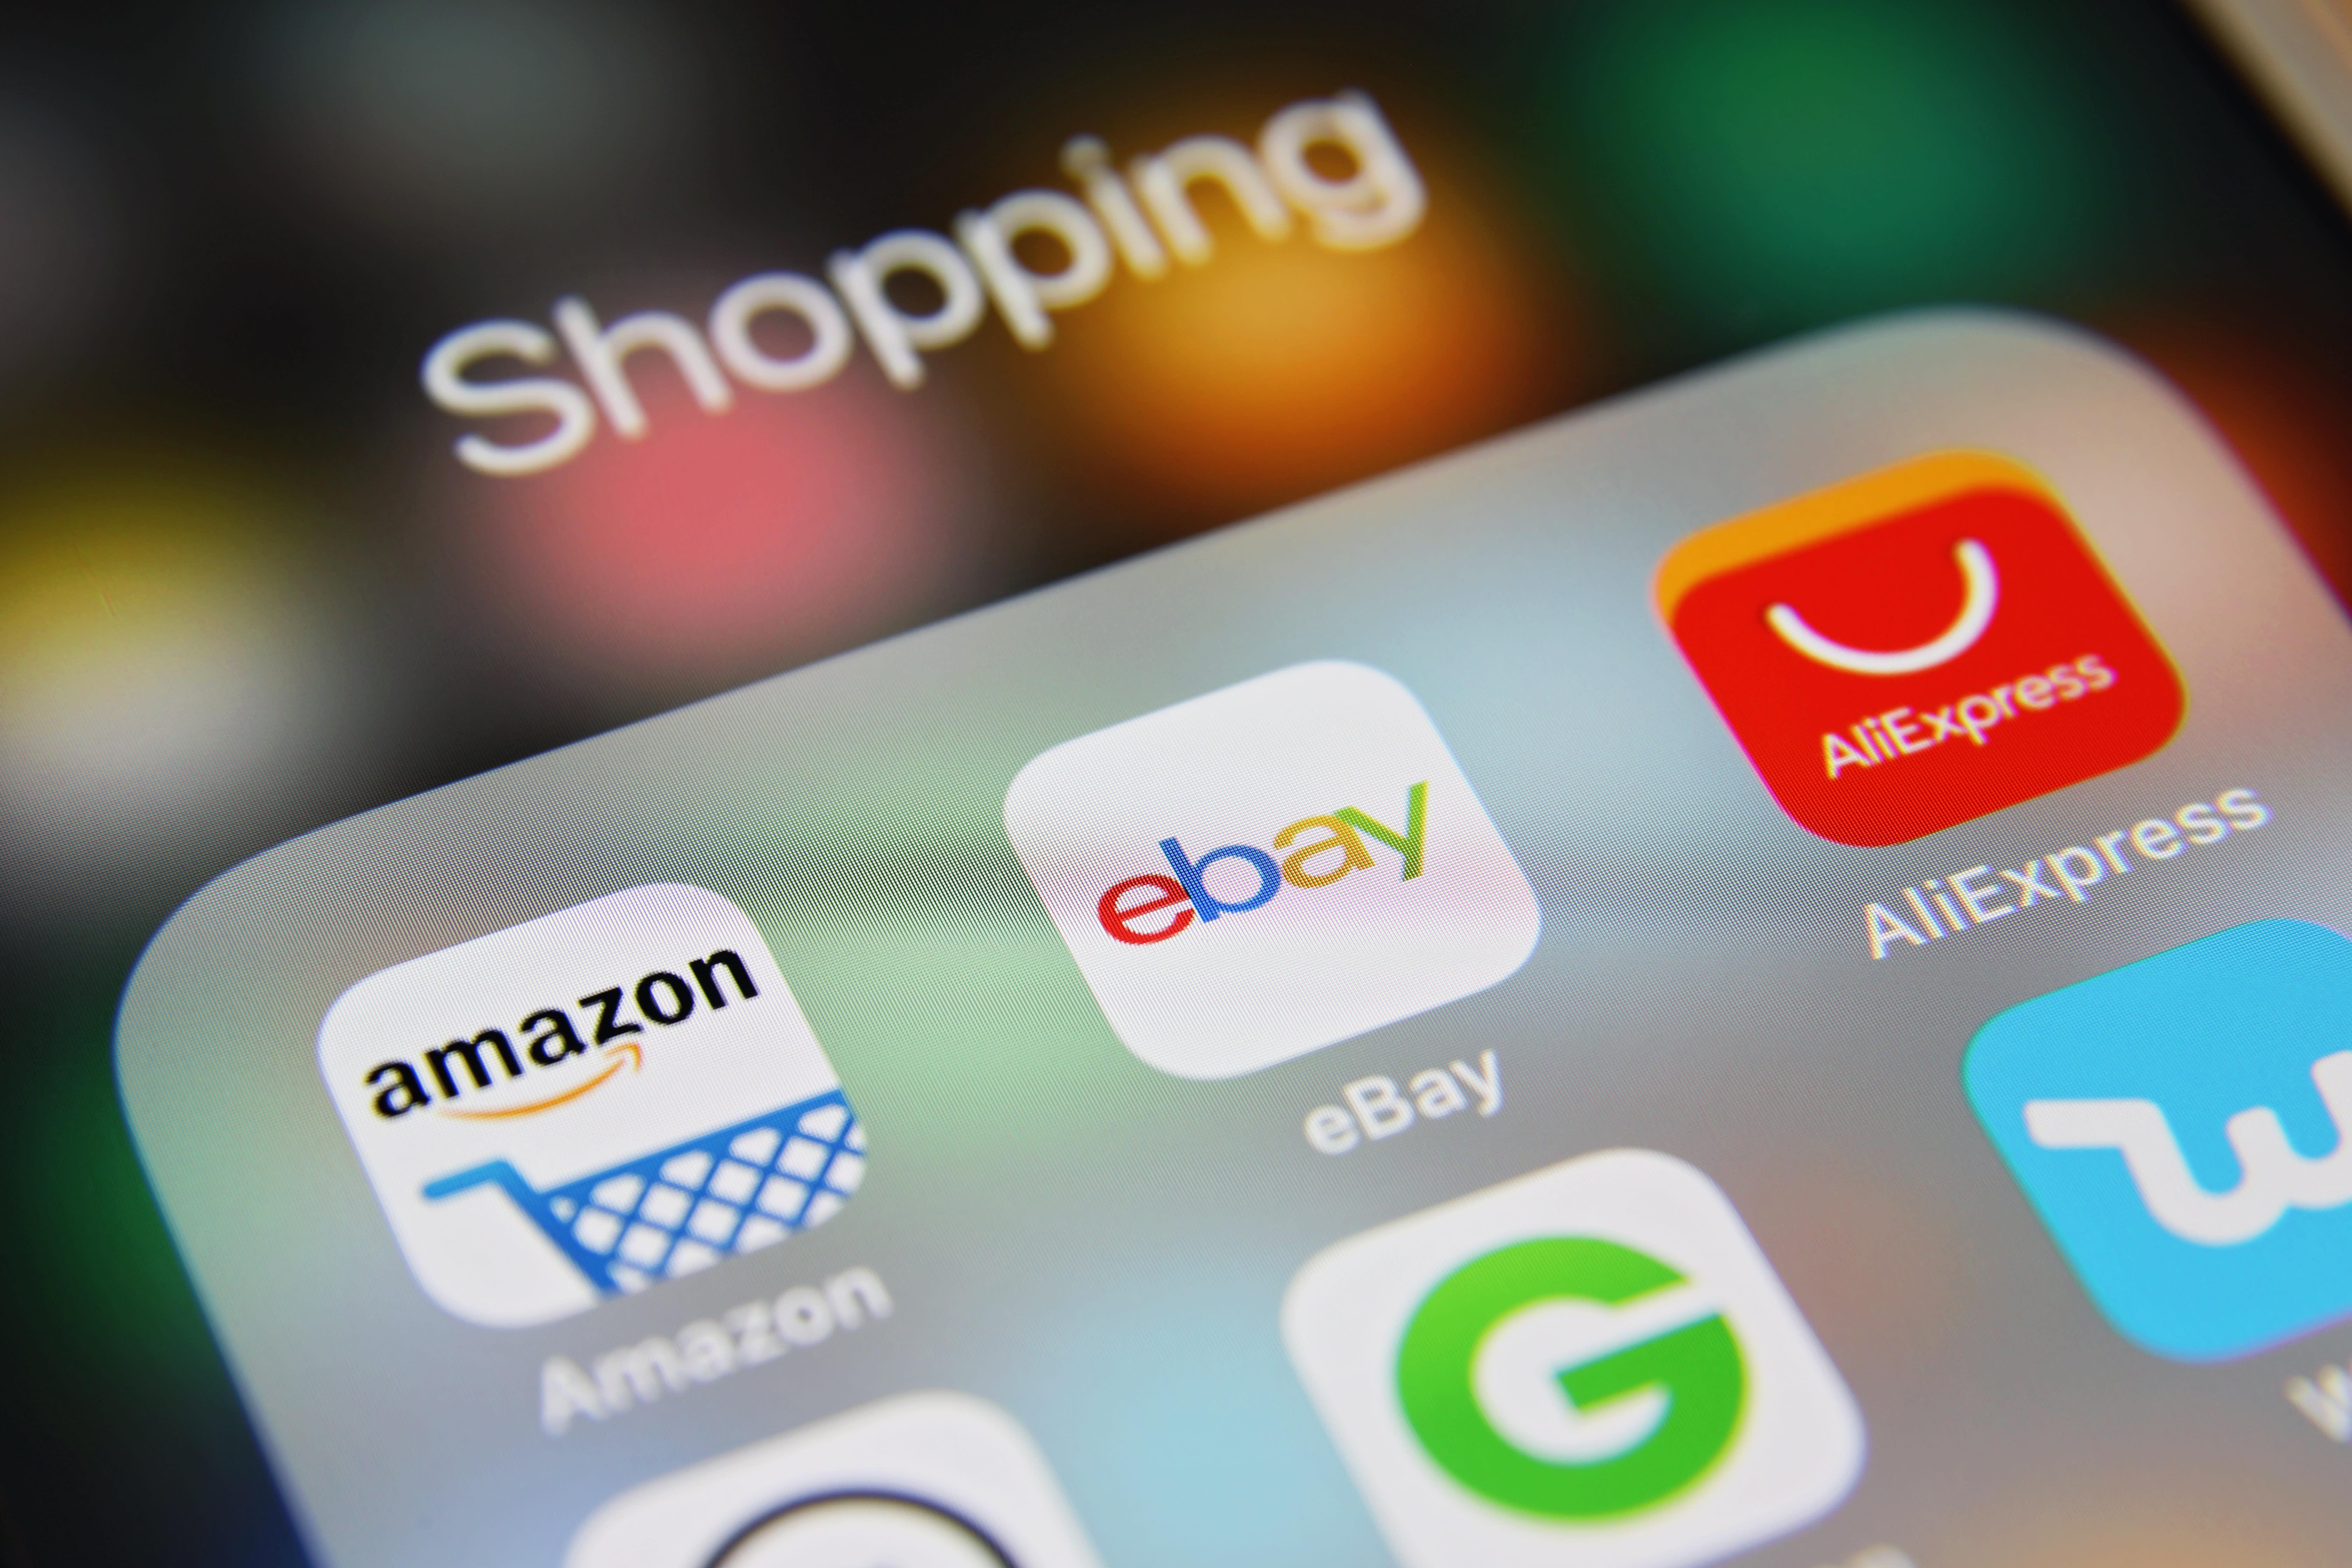 Ebay And Amazon Urged To Clamp Down On Coronavirus Profiteering